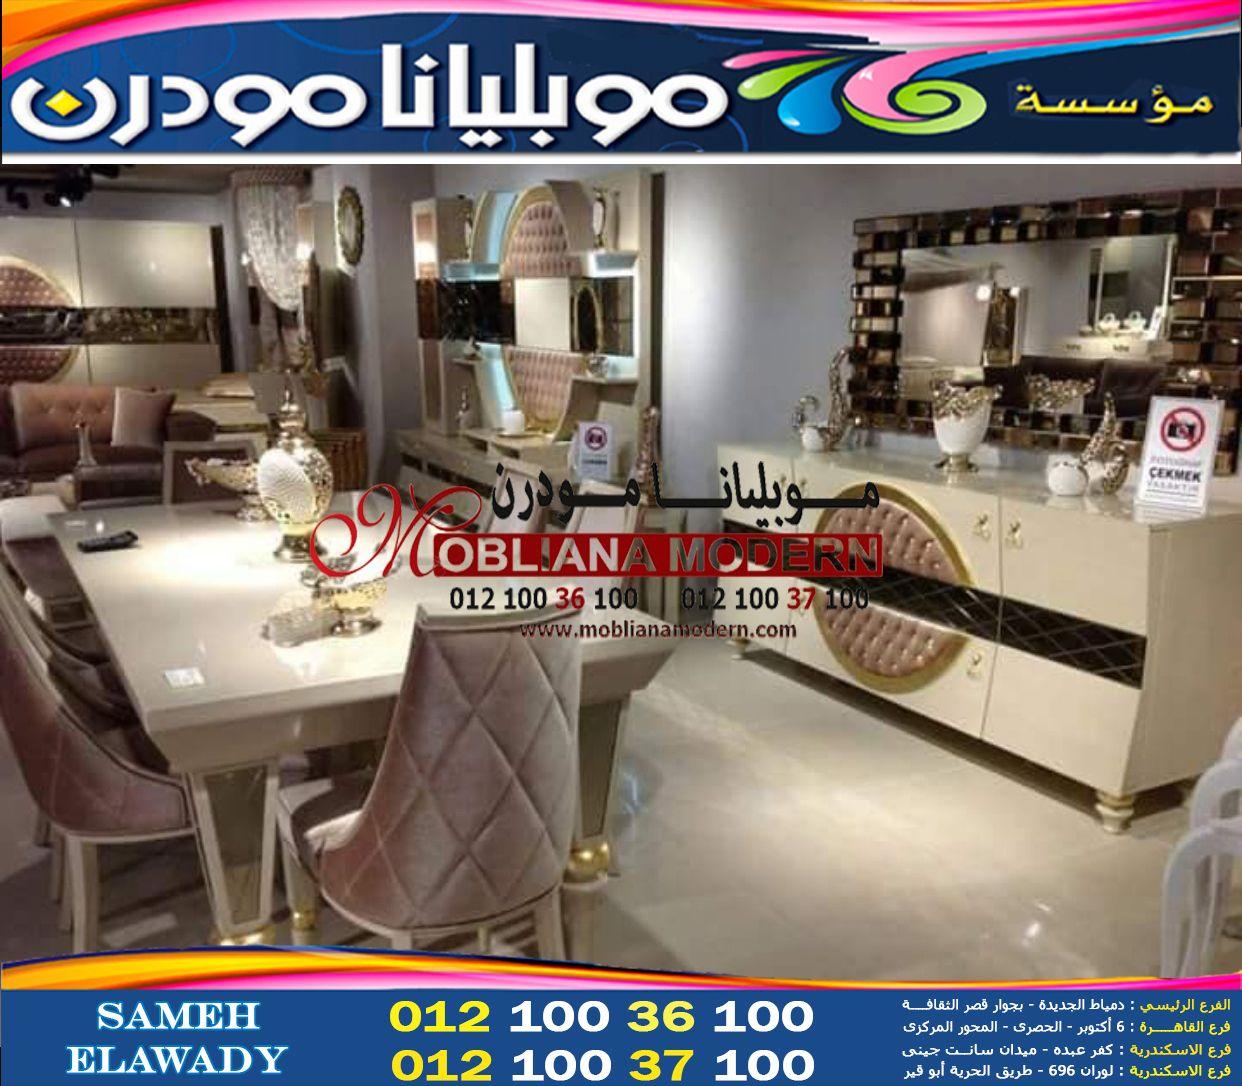 ألوان غرف سفرة مودرن تشكيلة غرف نوم و سفرة موبليانا مودرن Home Decor Room Furniture